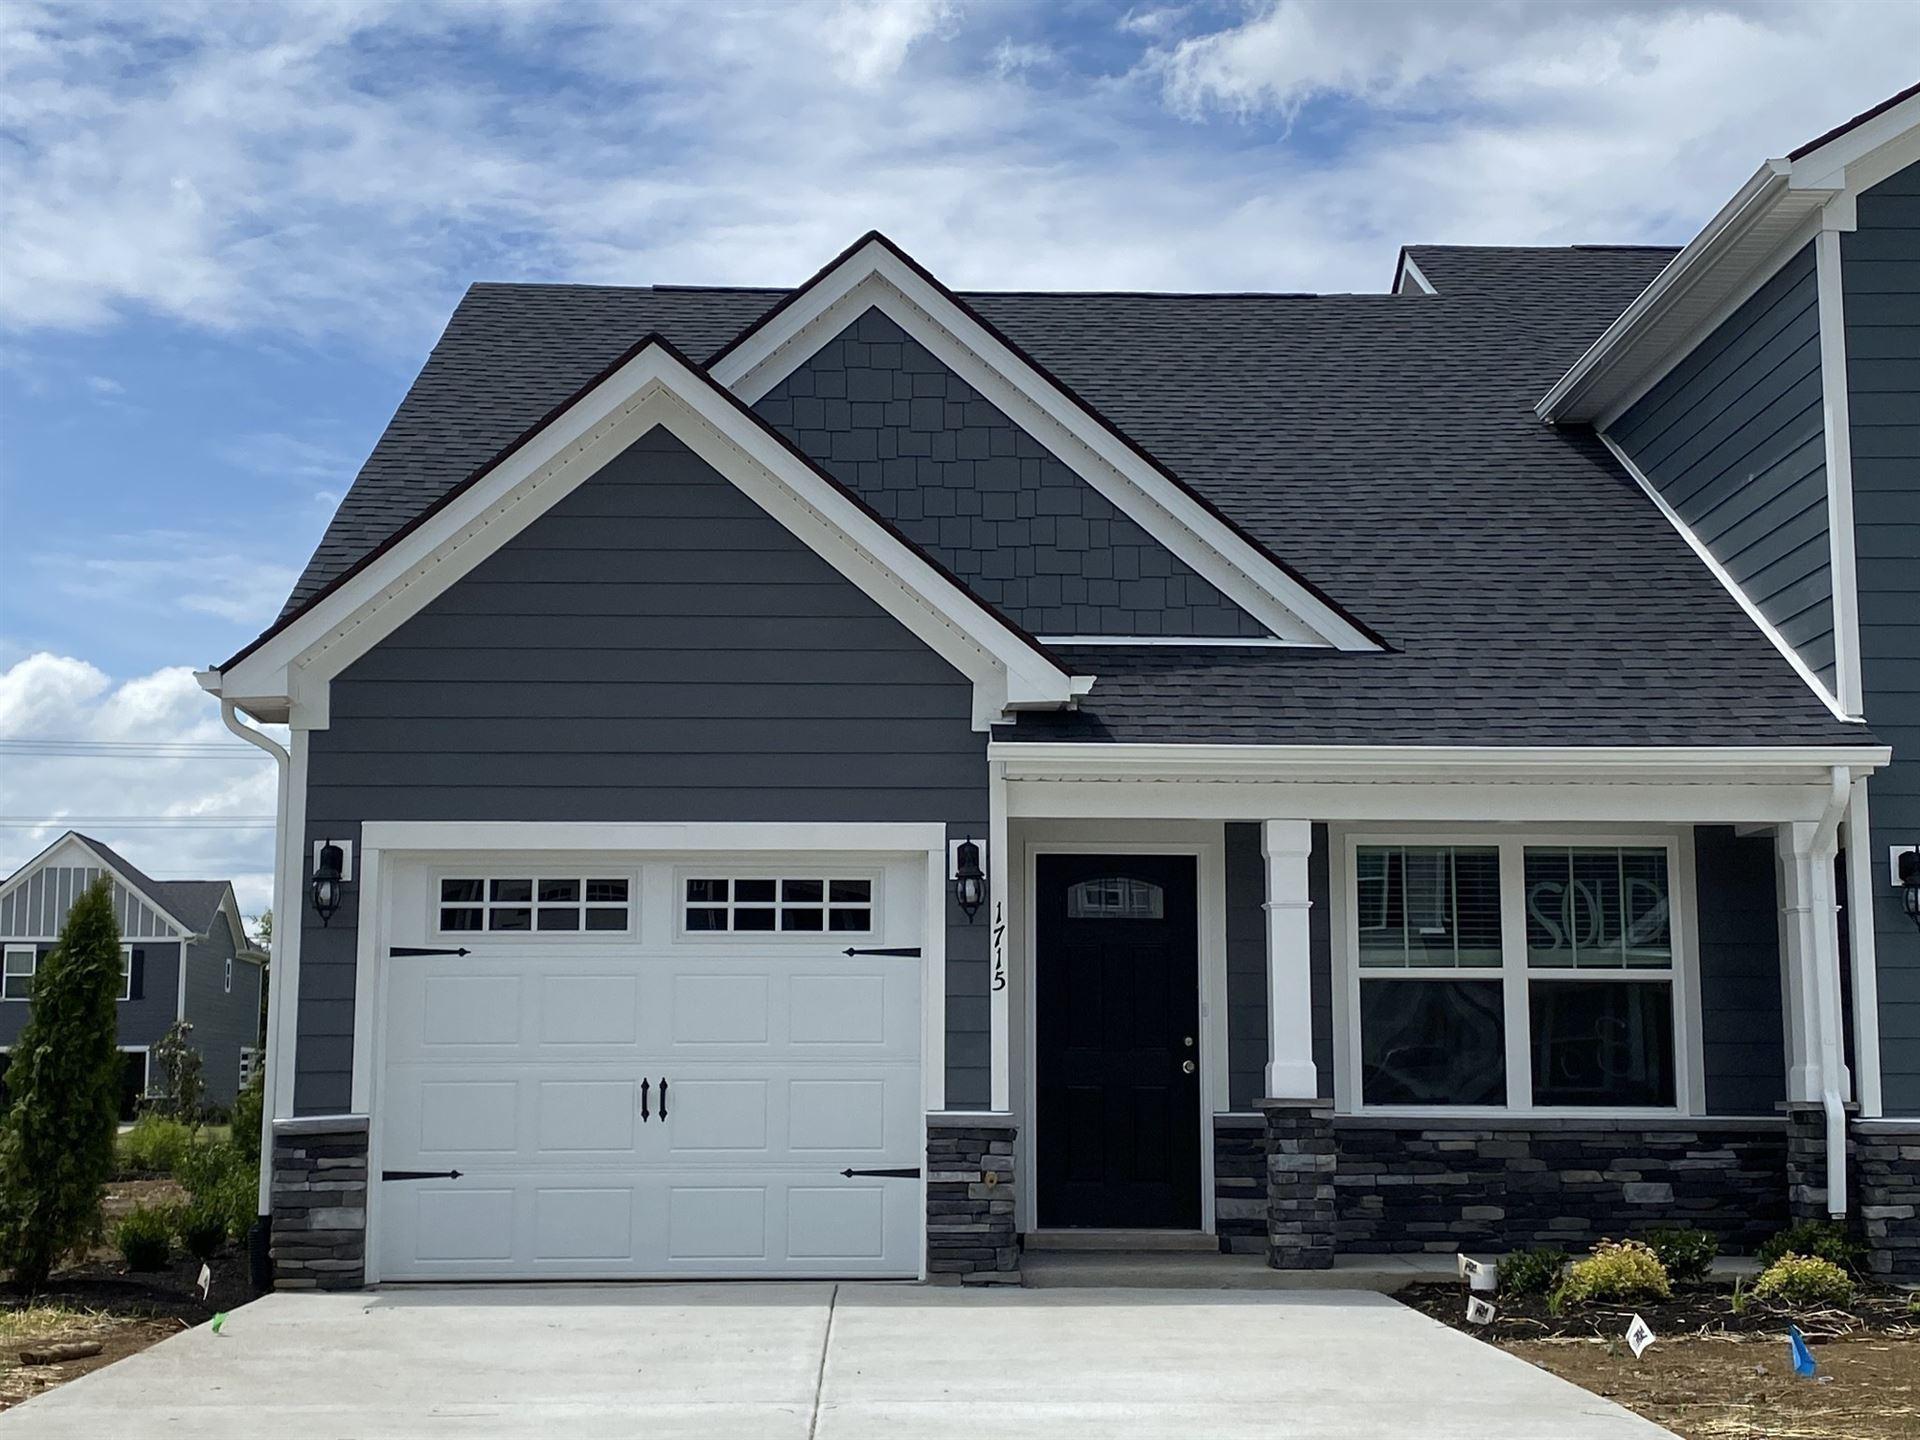 5251 Normandy Cob Drive Lot 44 #44, Murfreesboro, TN 37129 - MLS#: 2300406